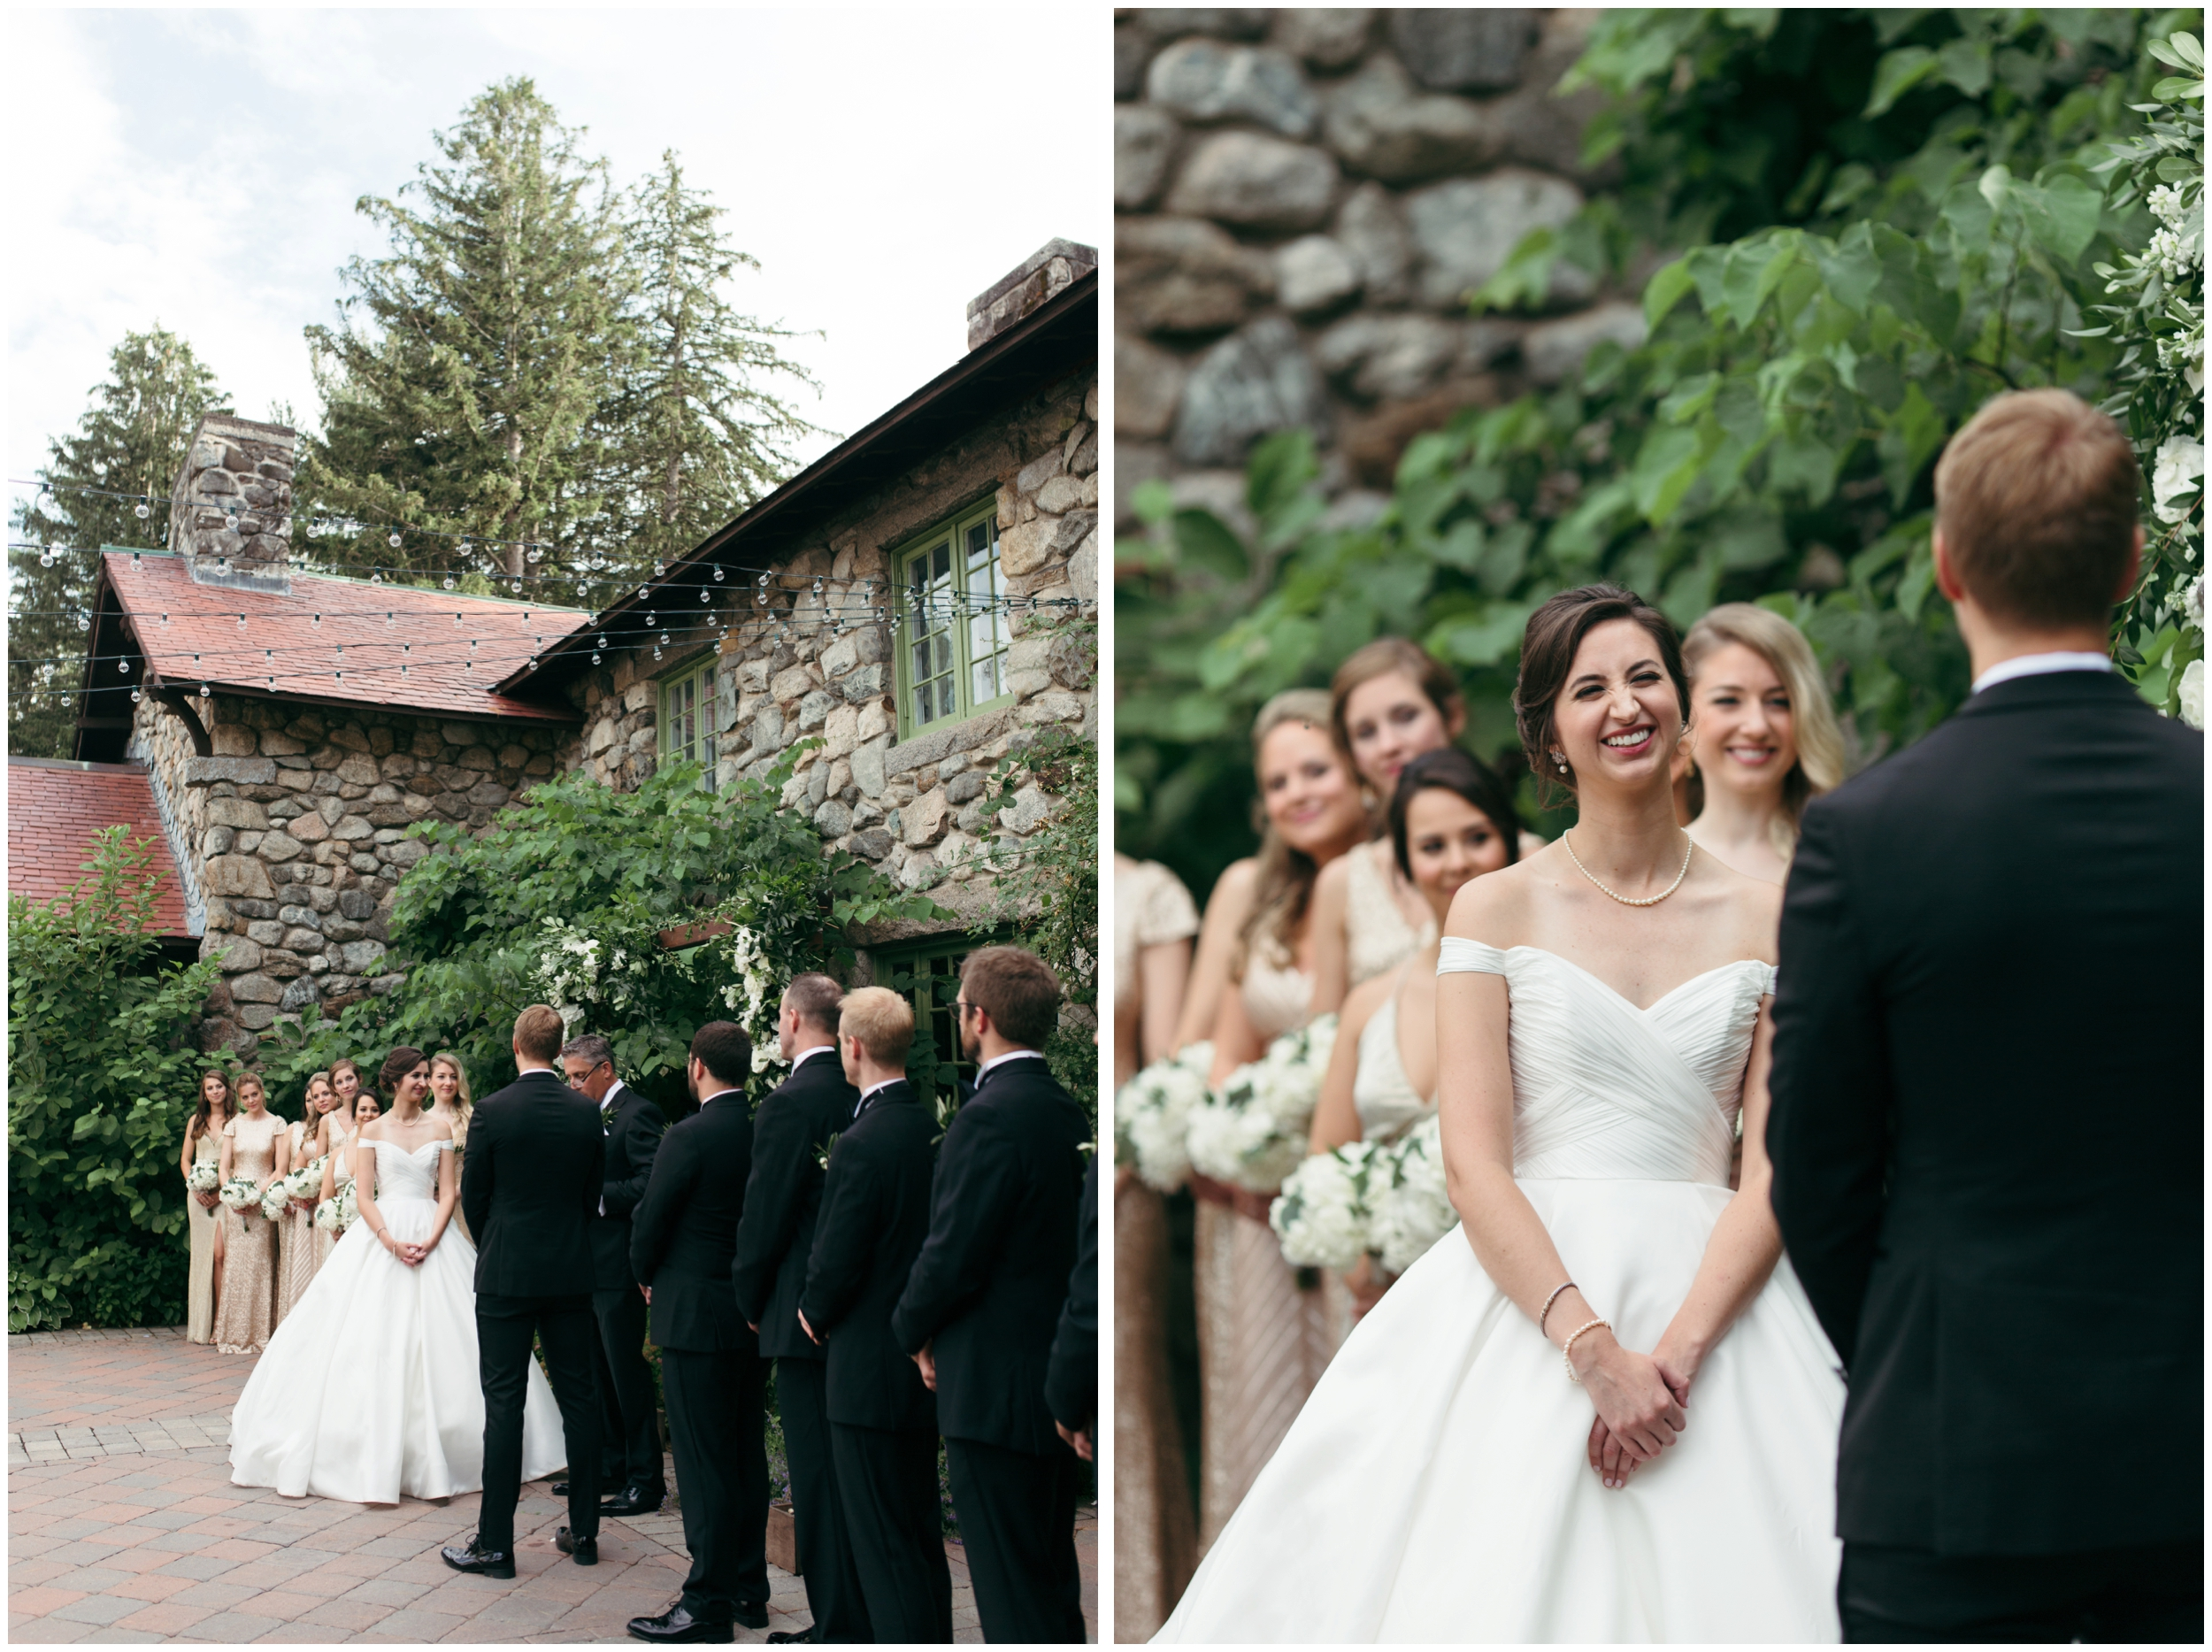 Willowdale-Estate-Wedding-Bailey-Q-Photo-Boston-Wedding-Photographer-030.JPG